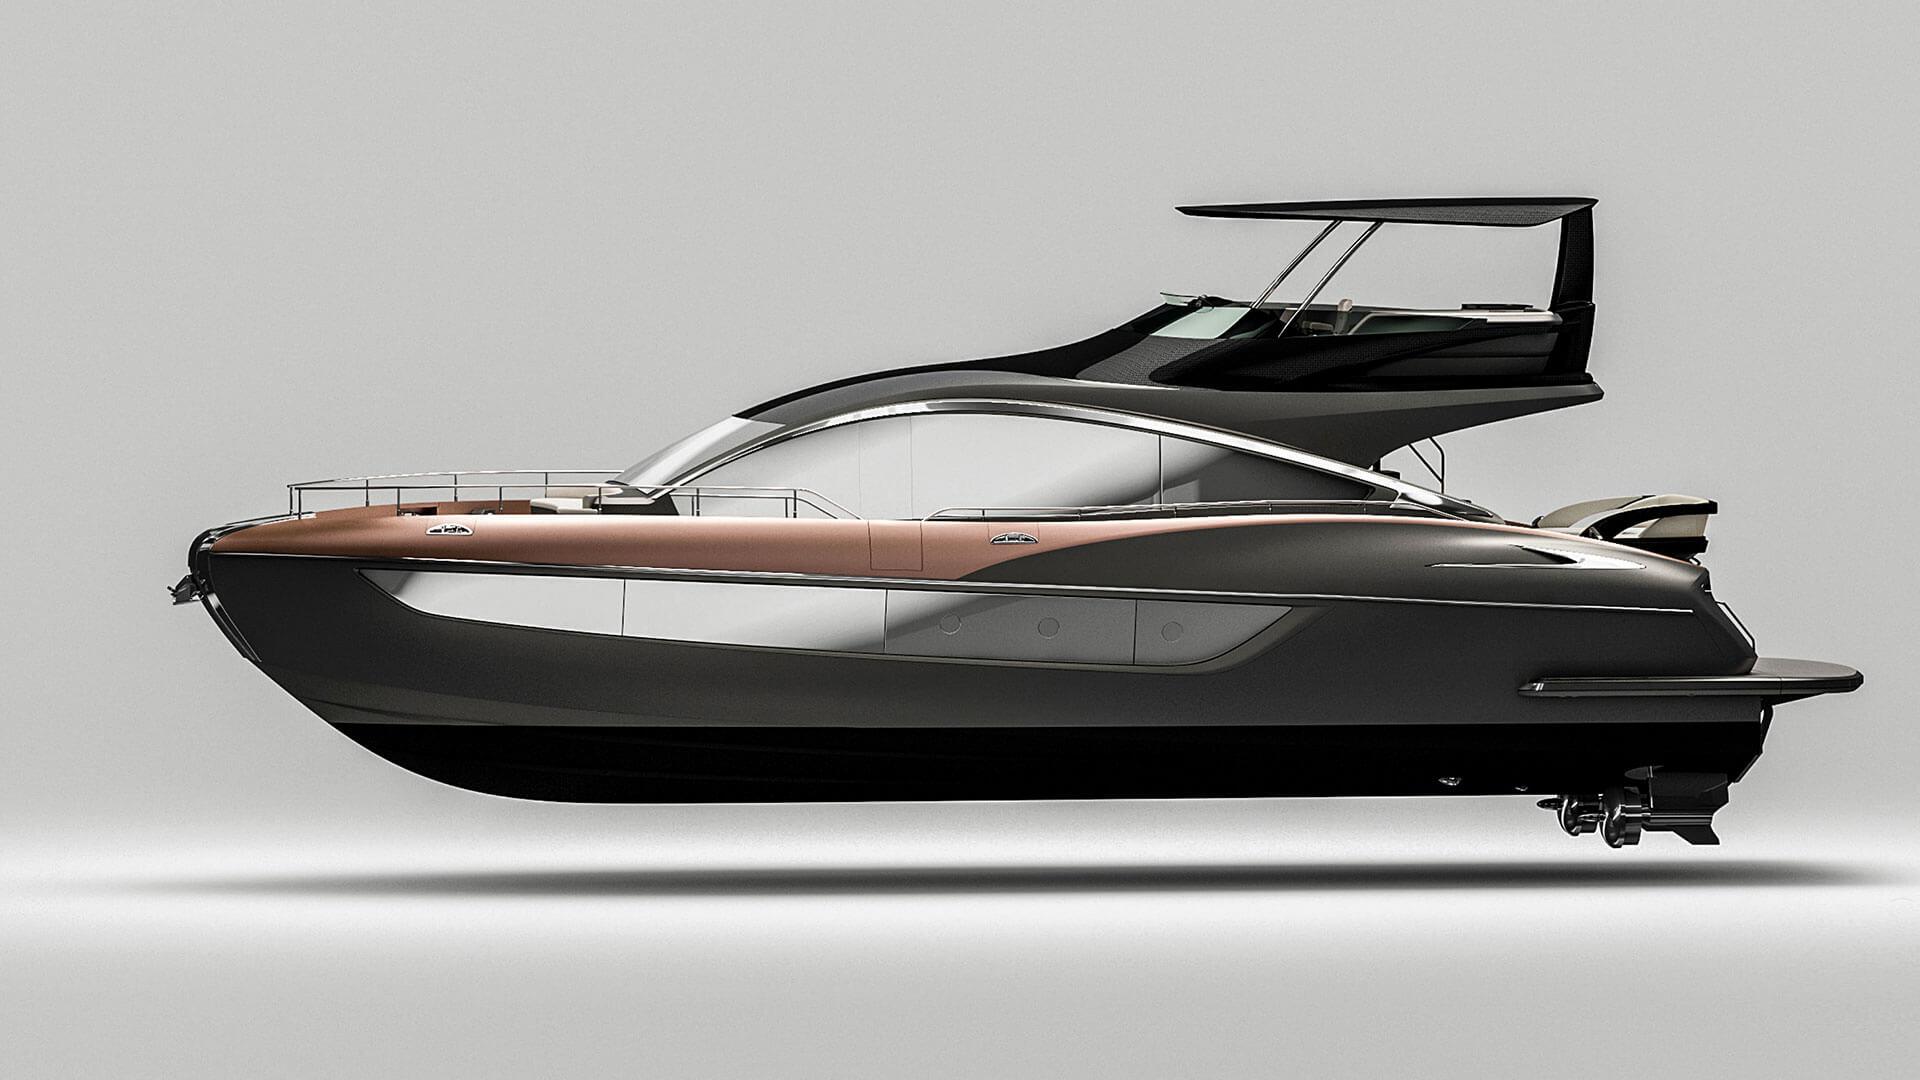 2019 lexus ly 650 luxury yacht gallery 11